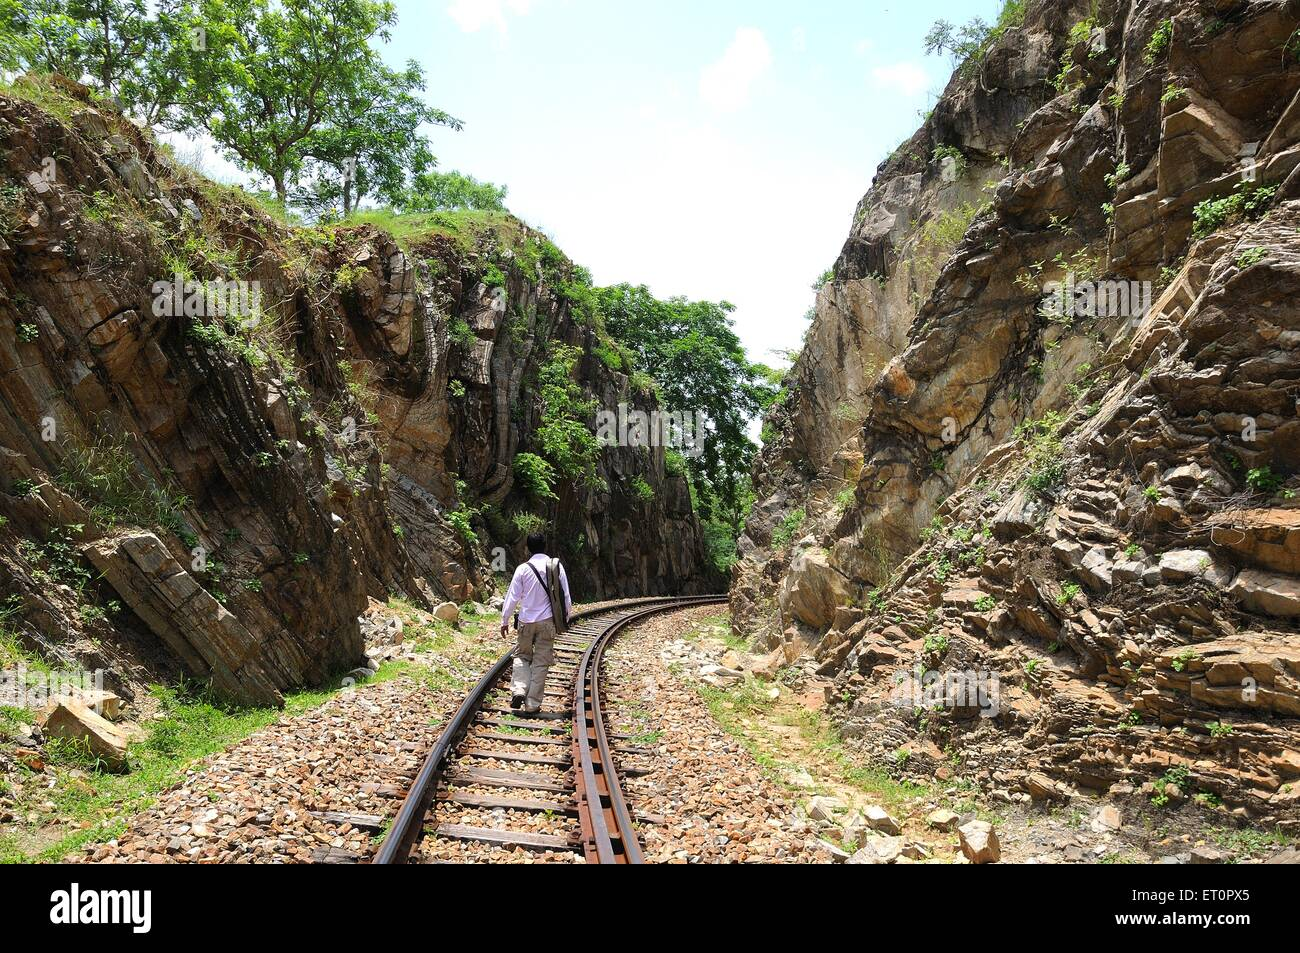 Man on railway line ; Goram ghat ; Marwar Junction ; Rajasthan ; India - Stock Image